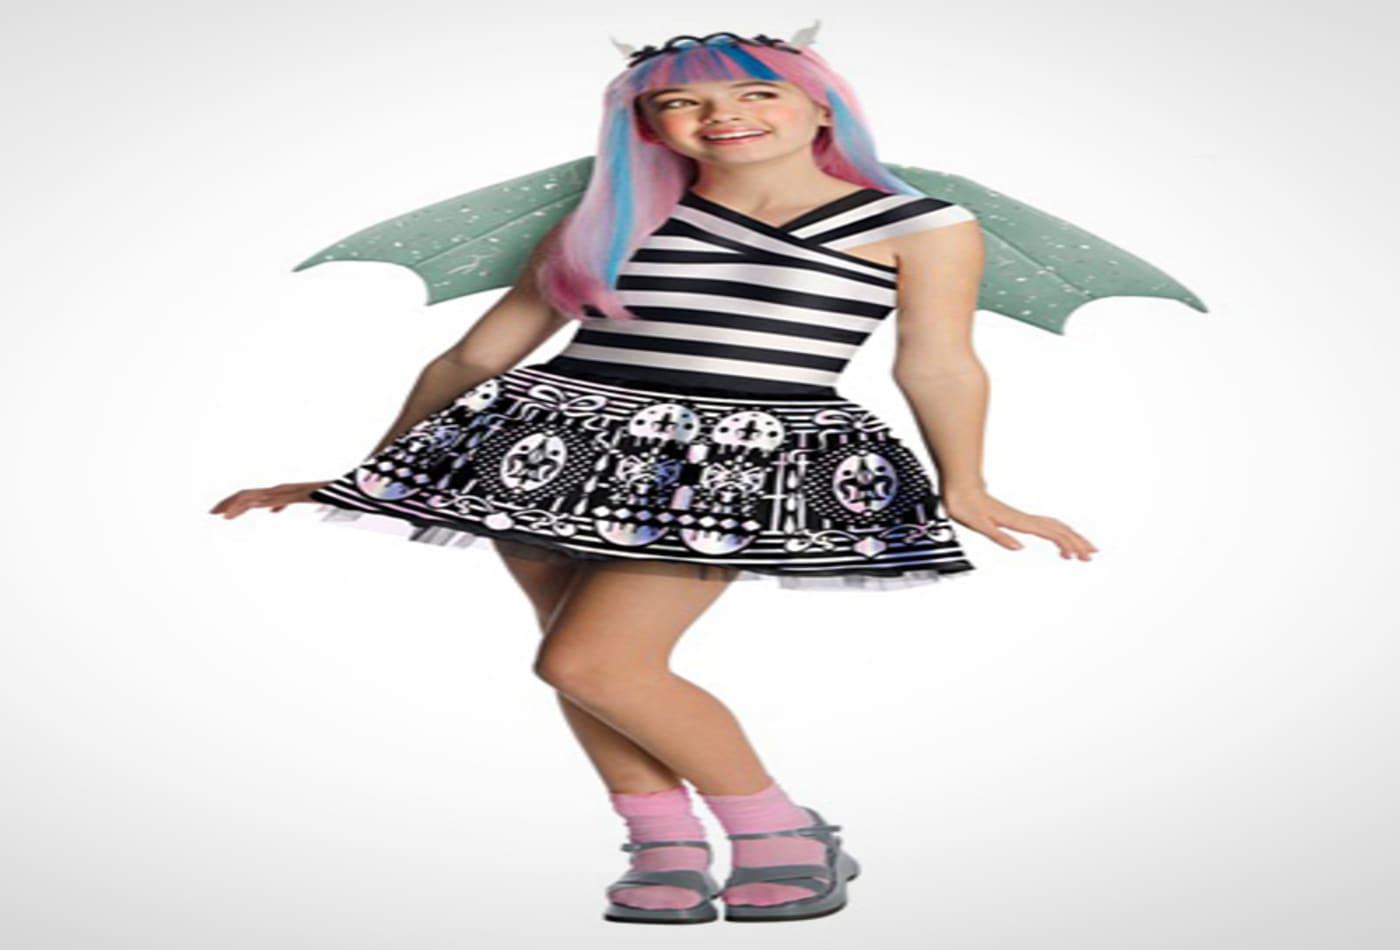 Halloween-costumes-kids-2012-rochelle-goyle.jpg